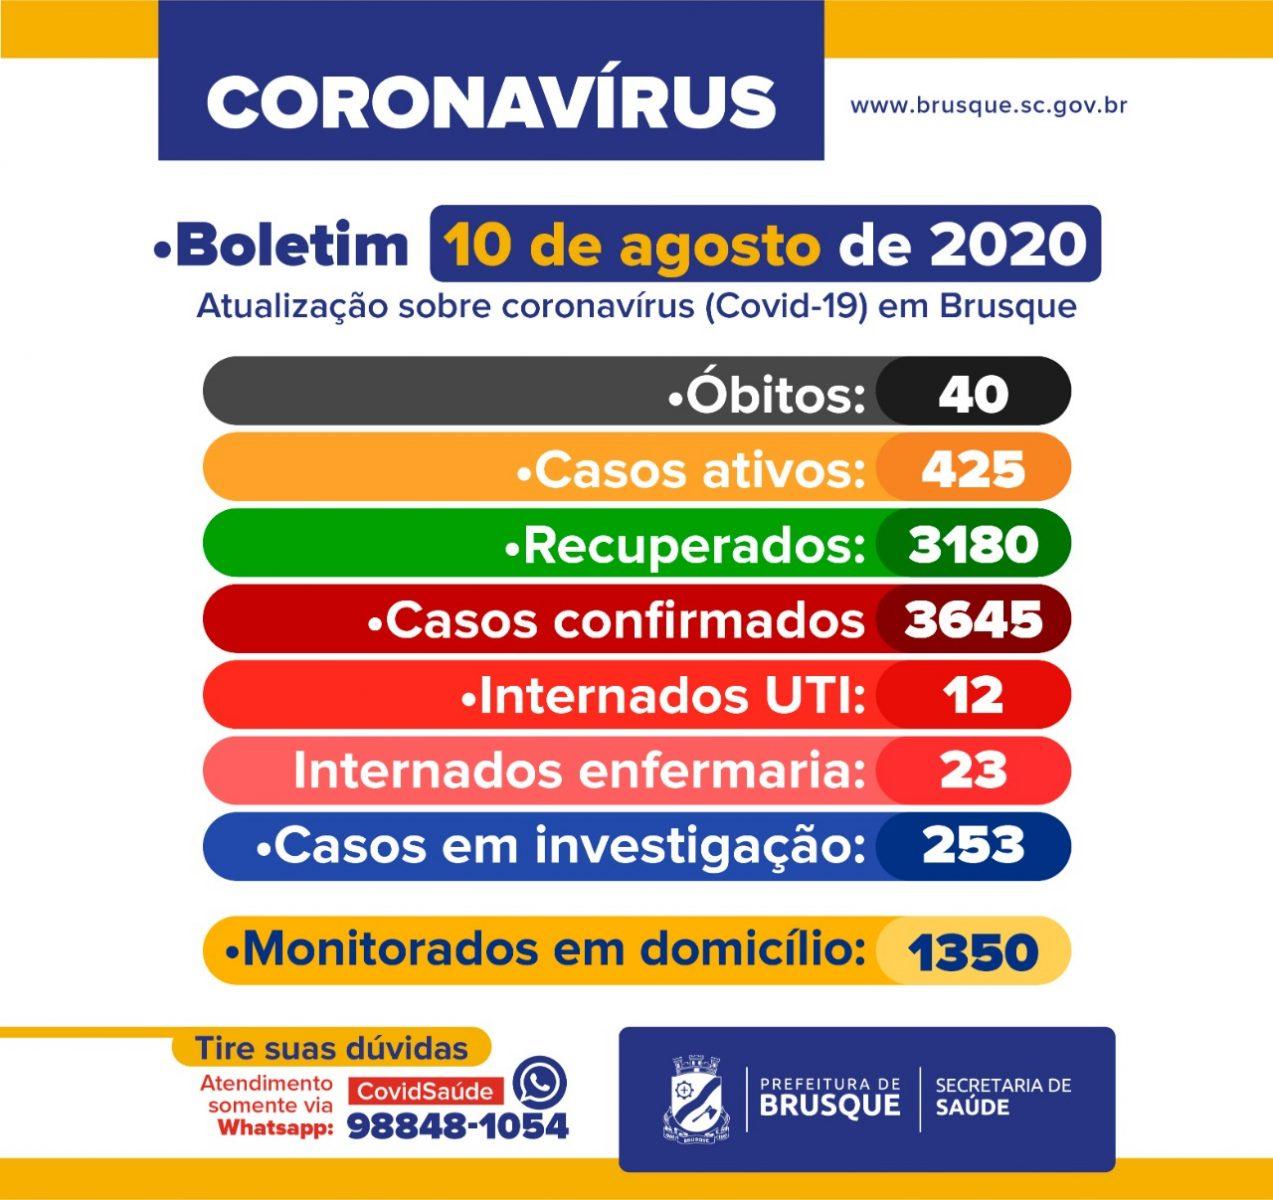 Confira o Boletim Epidemiológico da Prefeitura de Brusque desta segunda-feira (10)